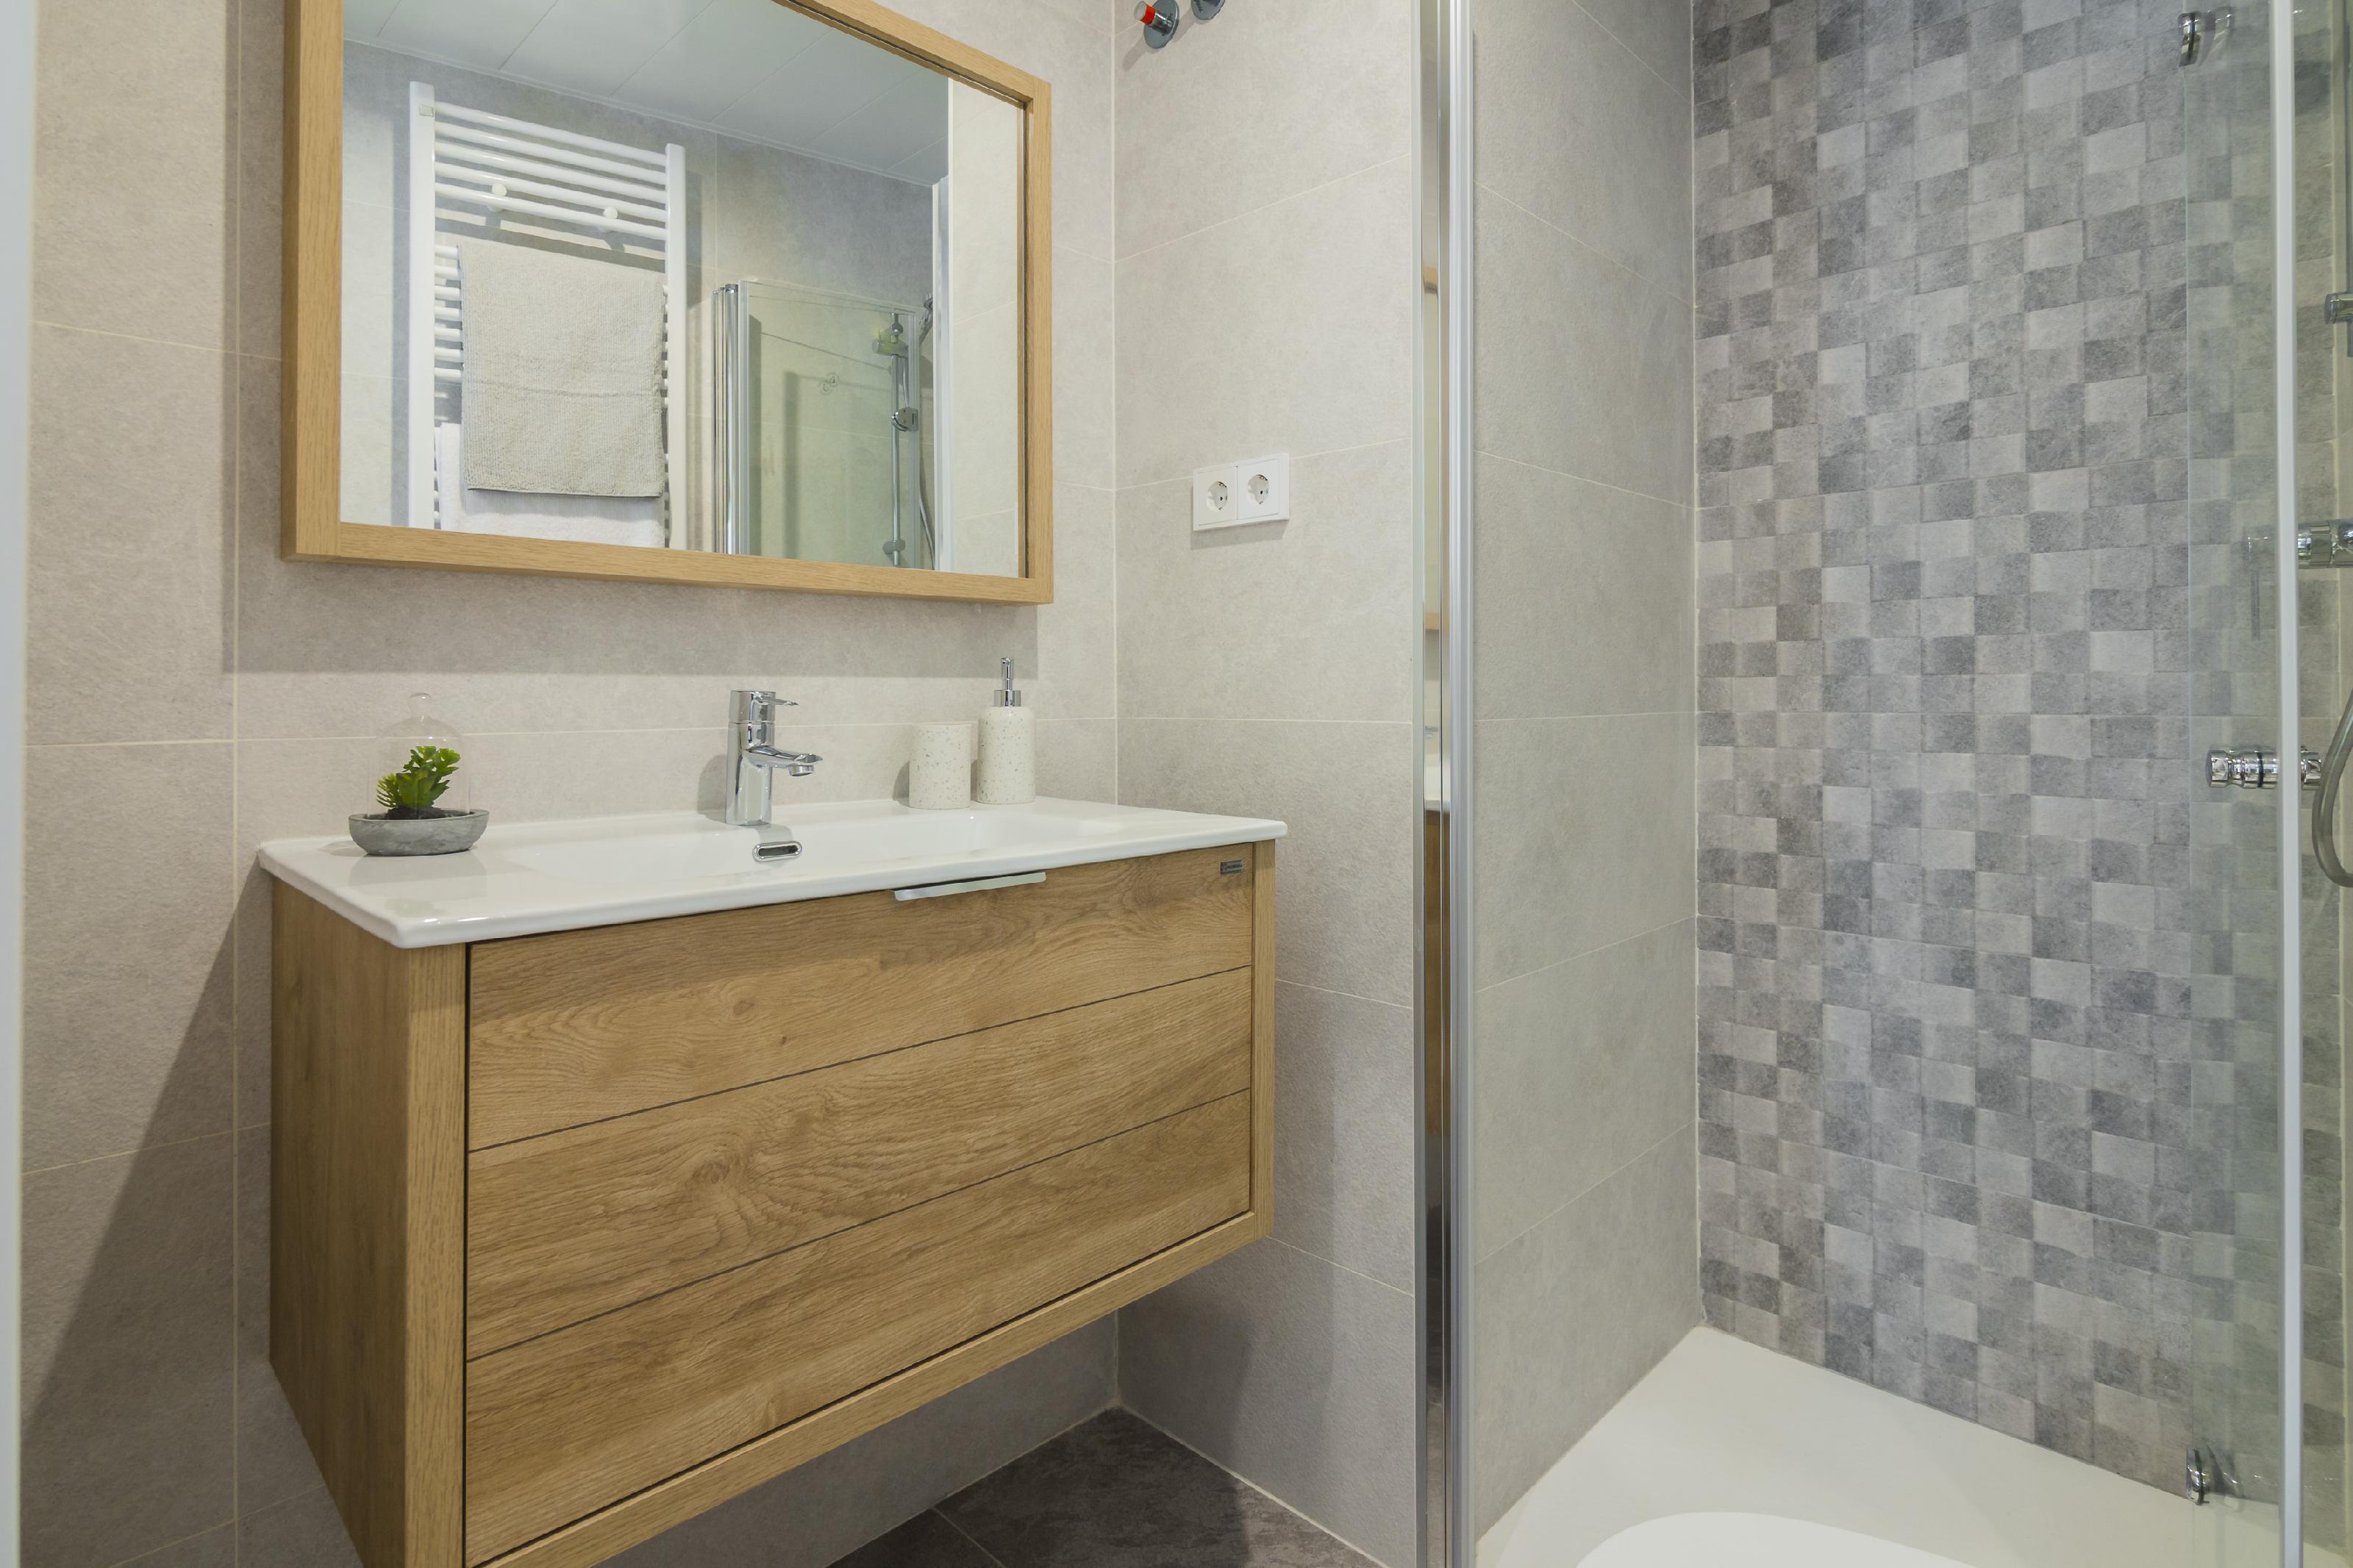 249266 Flat for sale in Eixample, Nova Esquerra Eixample 12